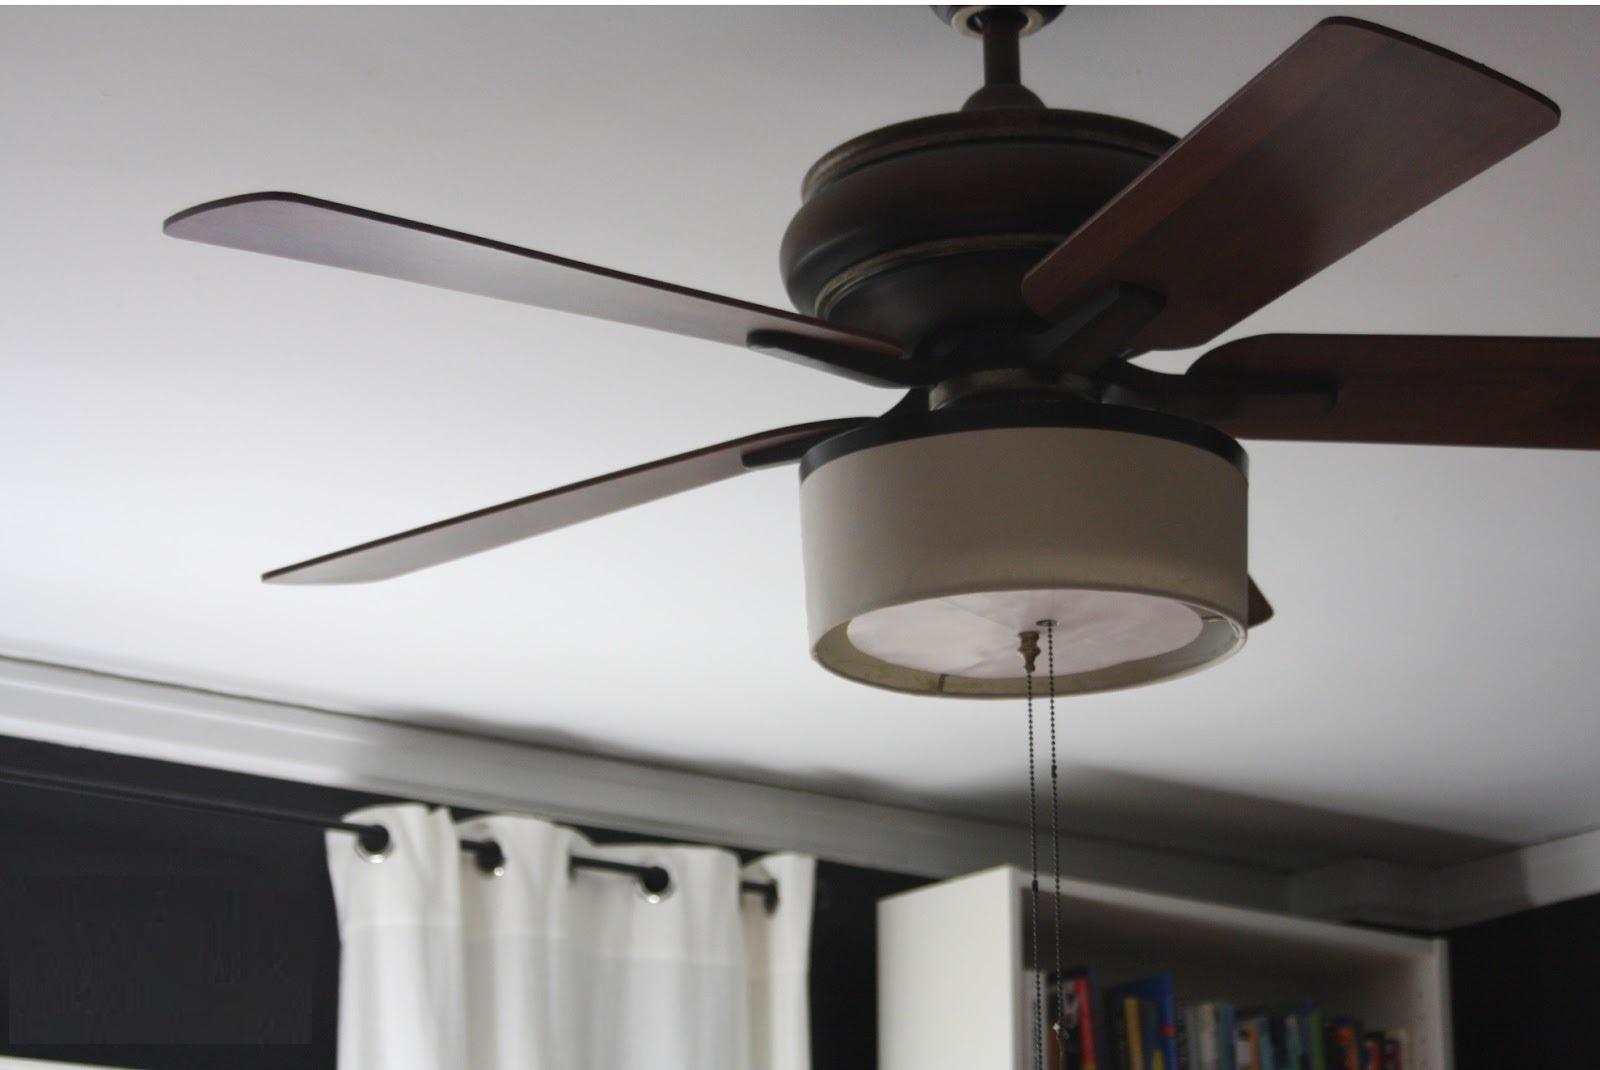 Diy Ceiling Fan Blades 10 Tips For Beginners Warisan